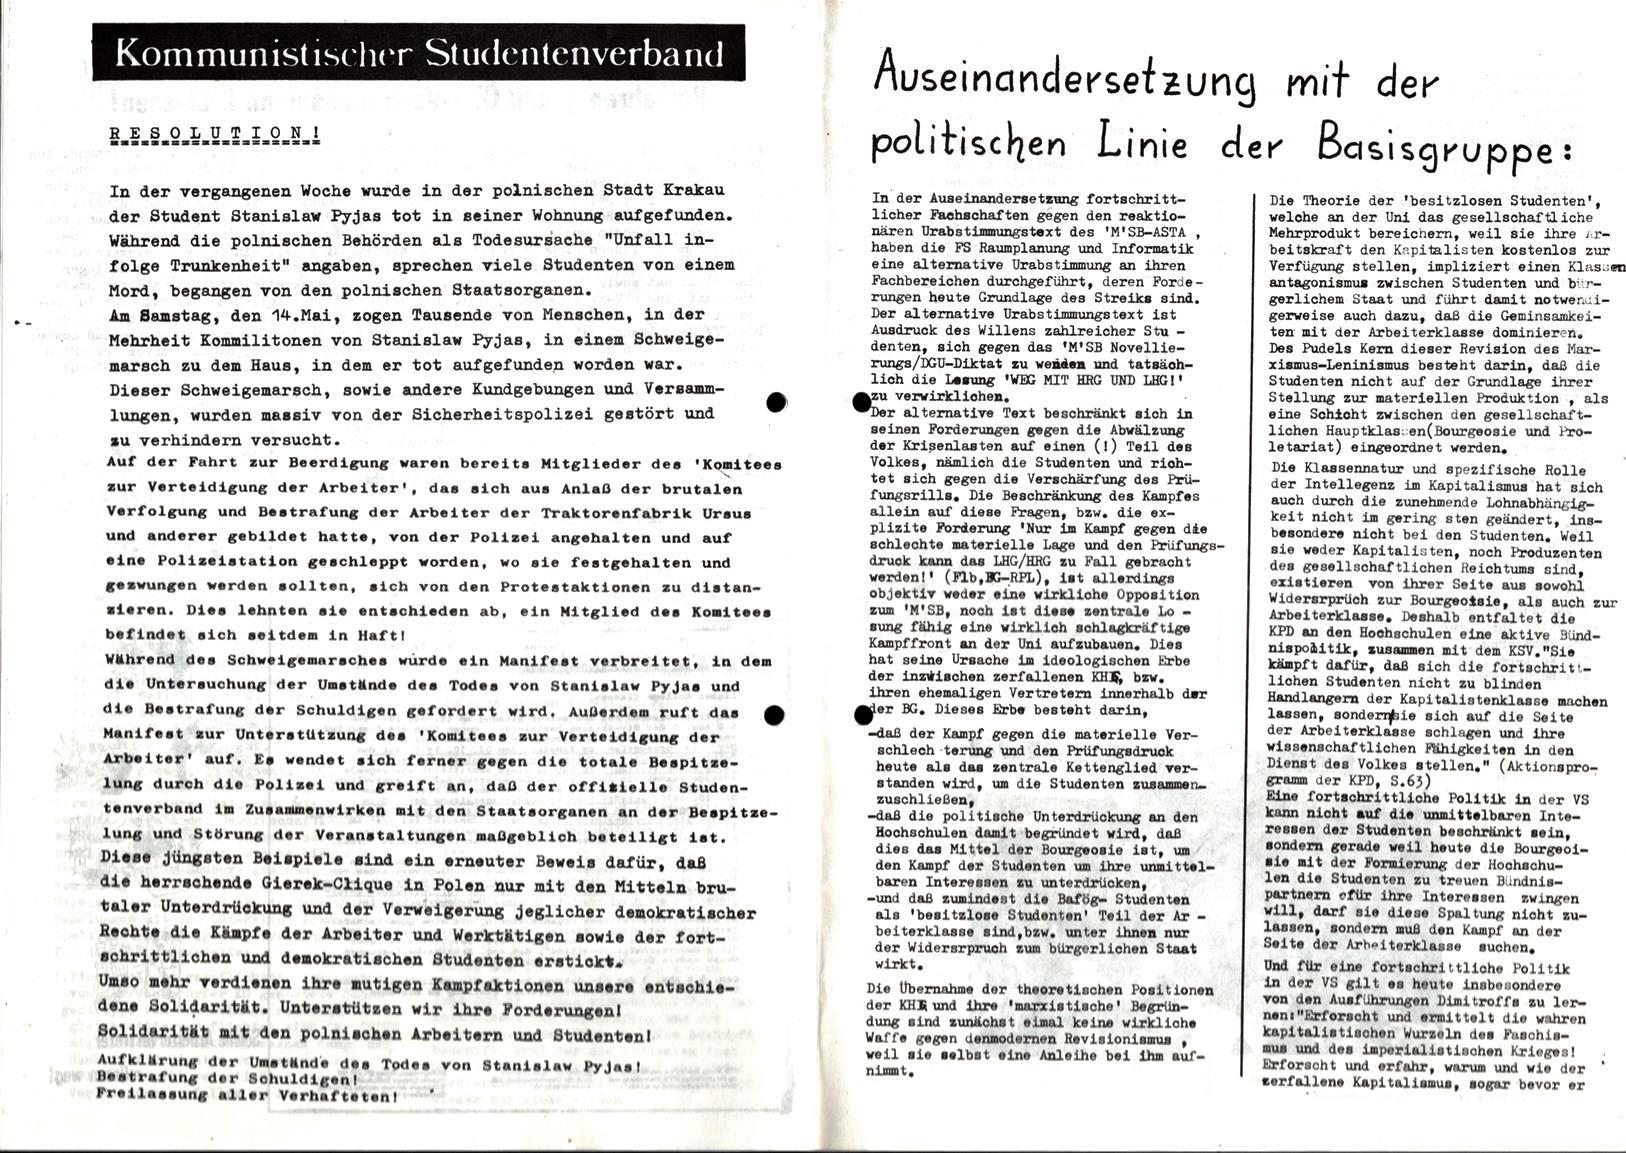 Dortmund_KSV_Studentenpresse_Uni_1977_05_17_004